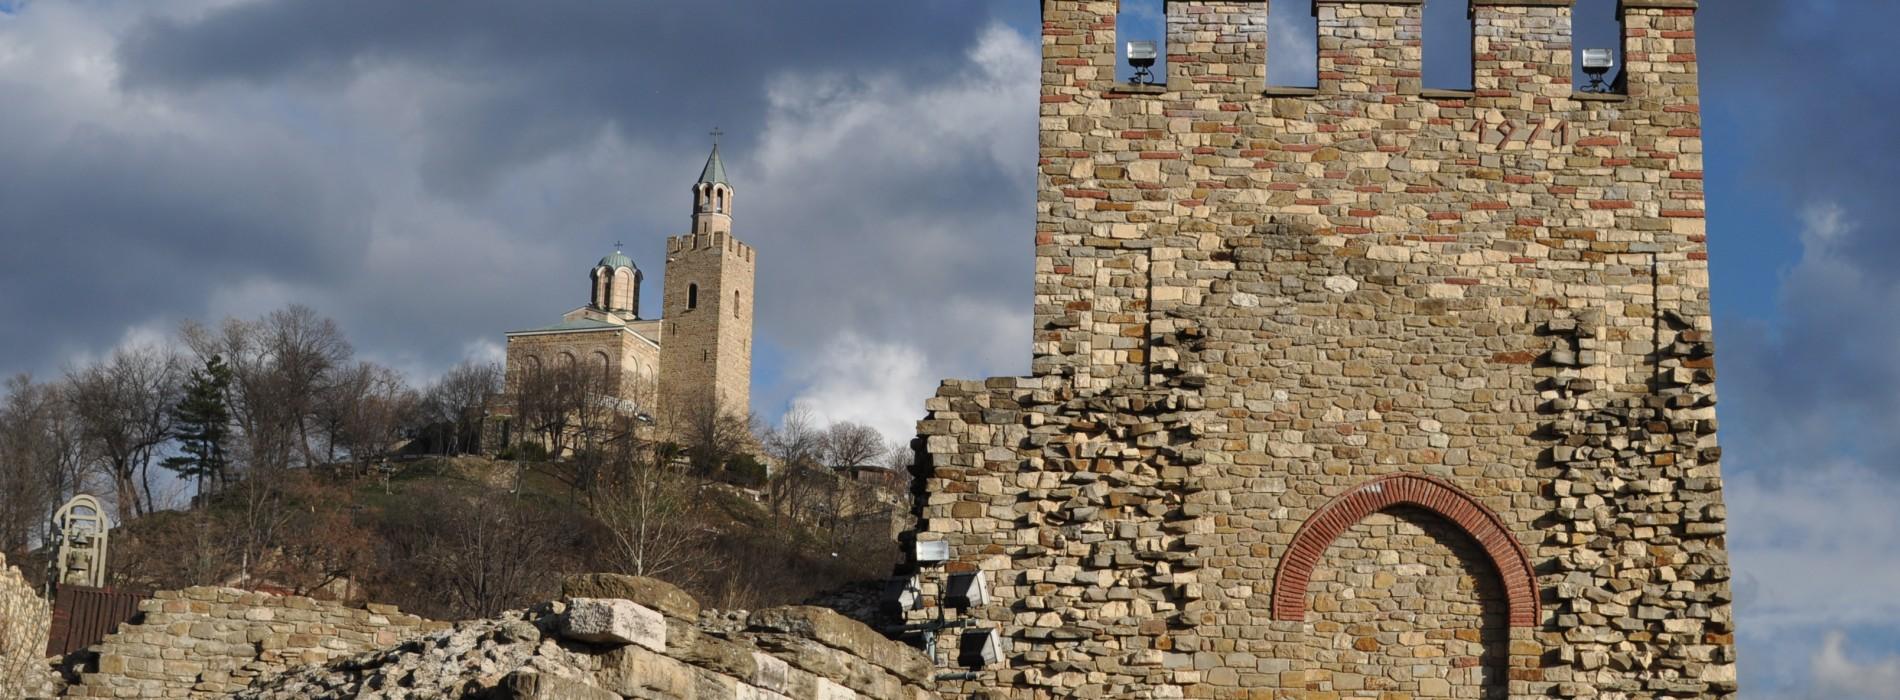 Iarna la Veliko Tarnovo